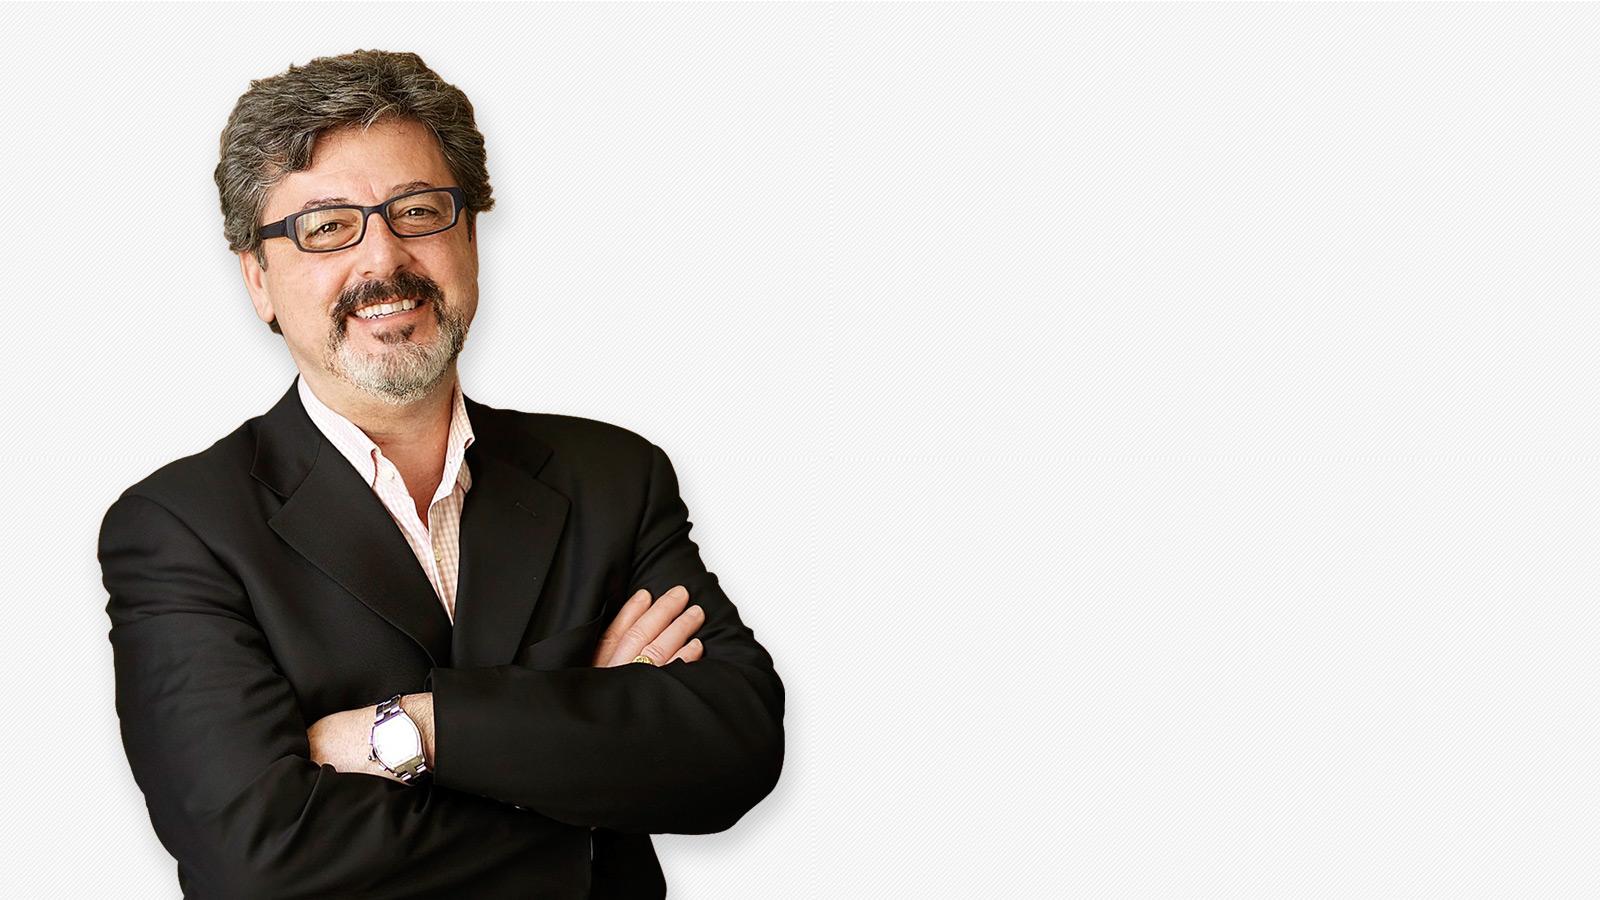 Aldo Cundari